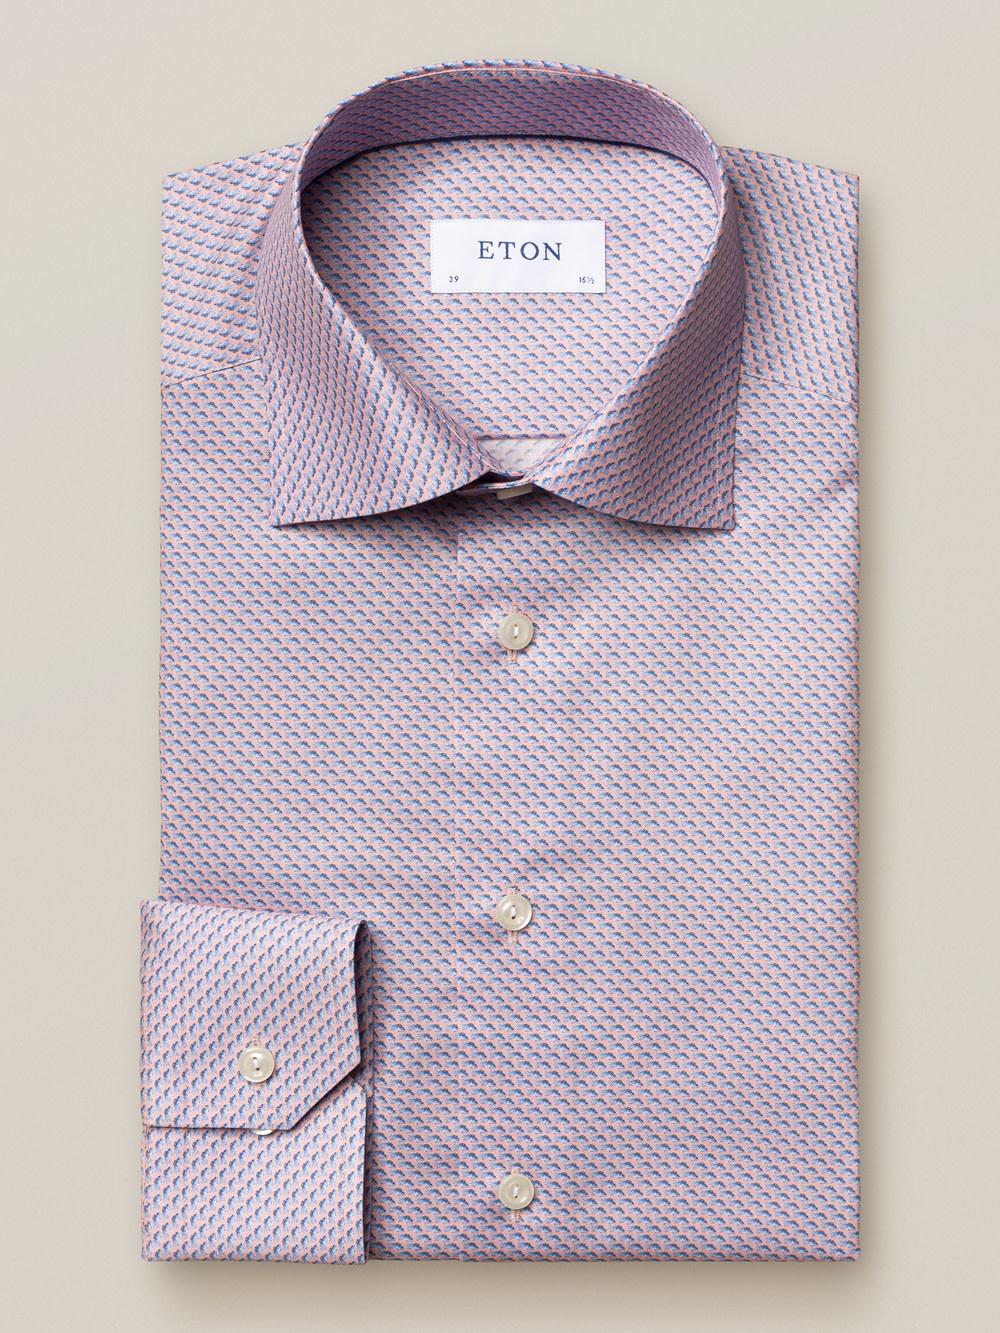 Eton Luxury Pink/Blue Geometric Twill shirt